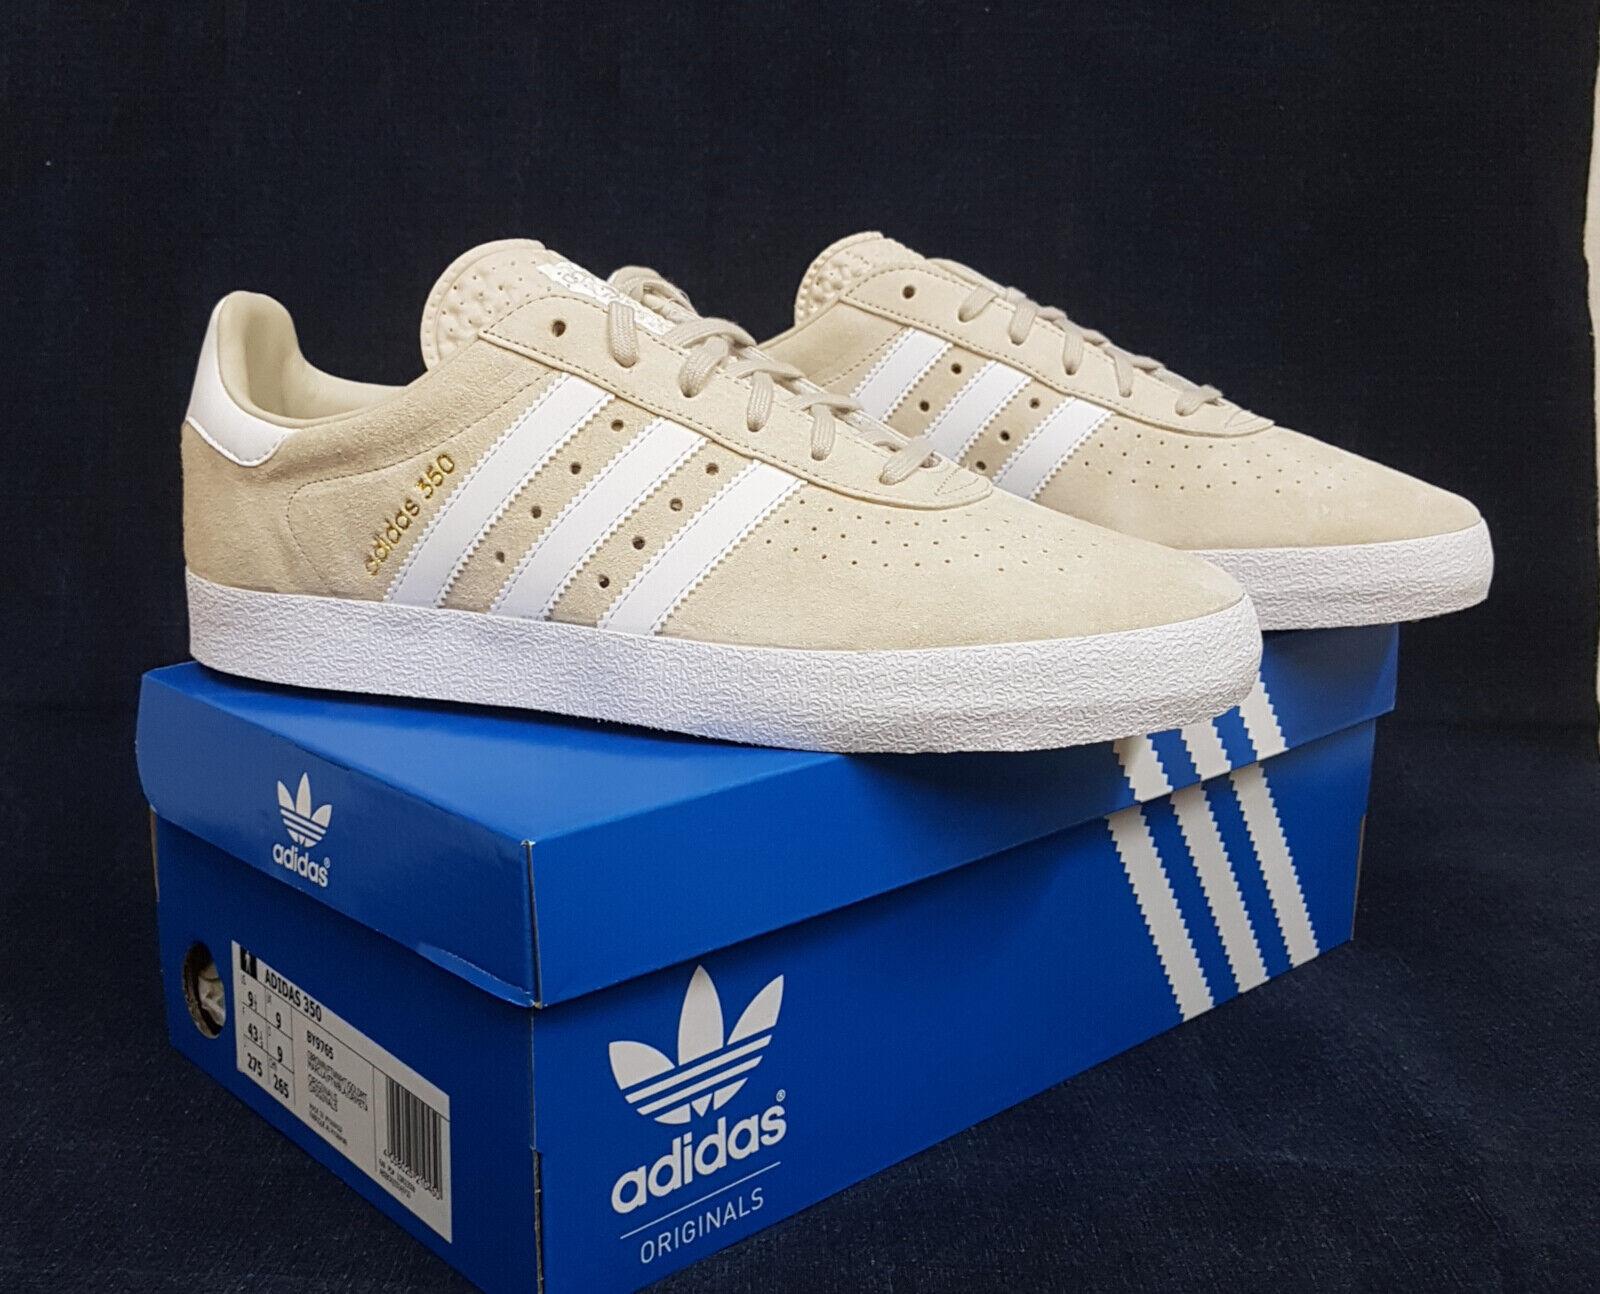 adidas originals 350 bianca